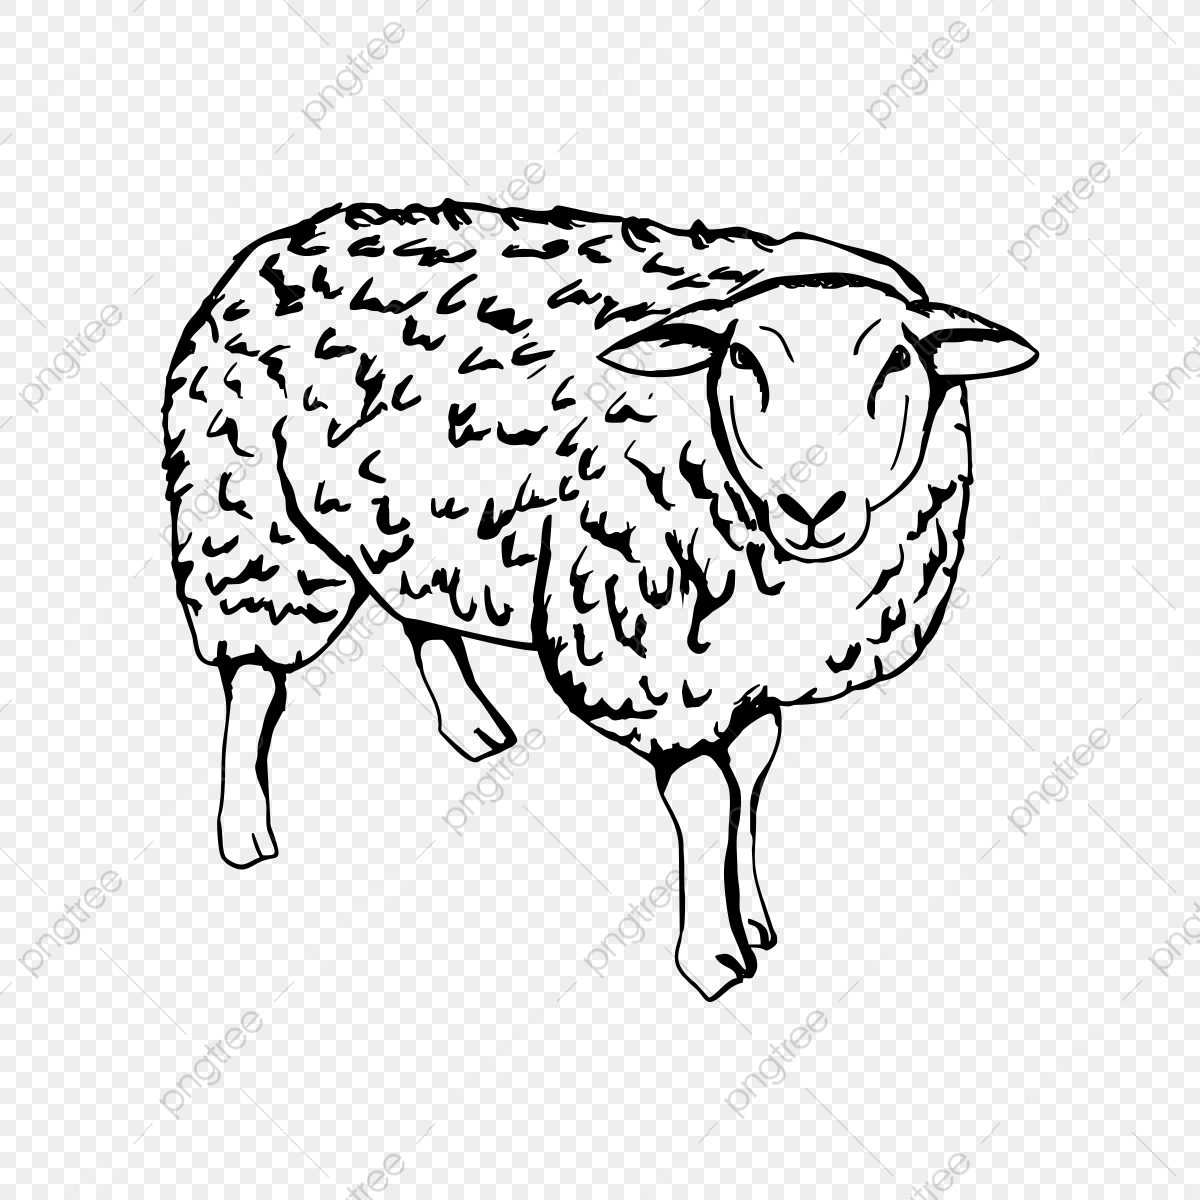 Hand drawn isolated illustration. Lamb clipart sheep drawing